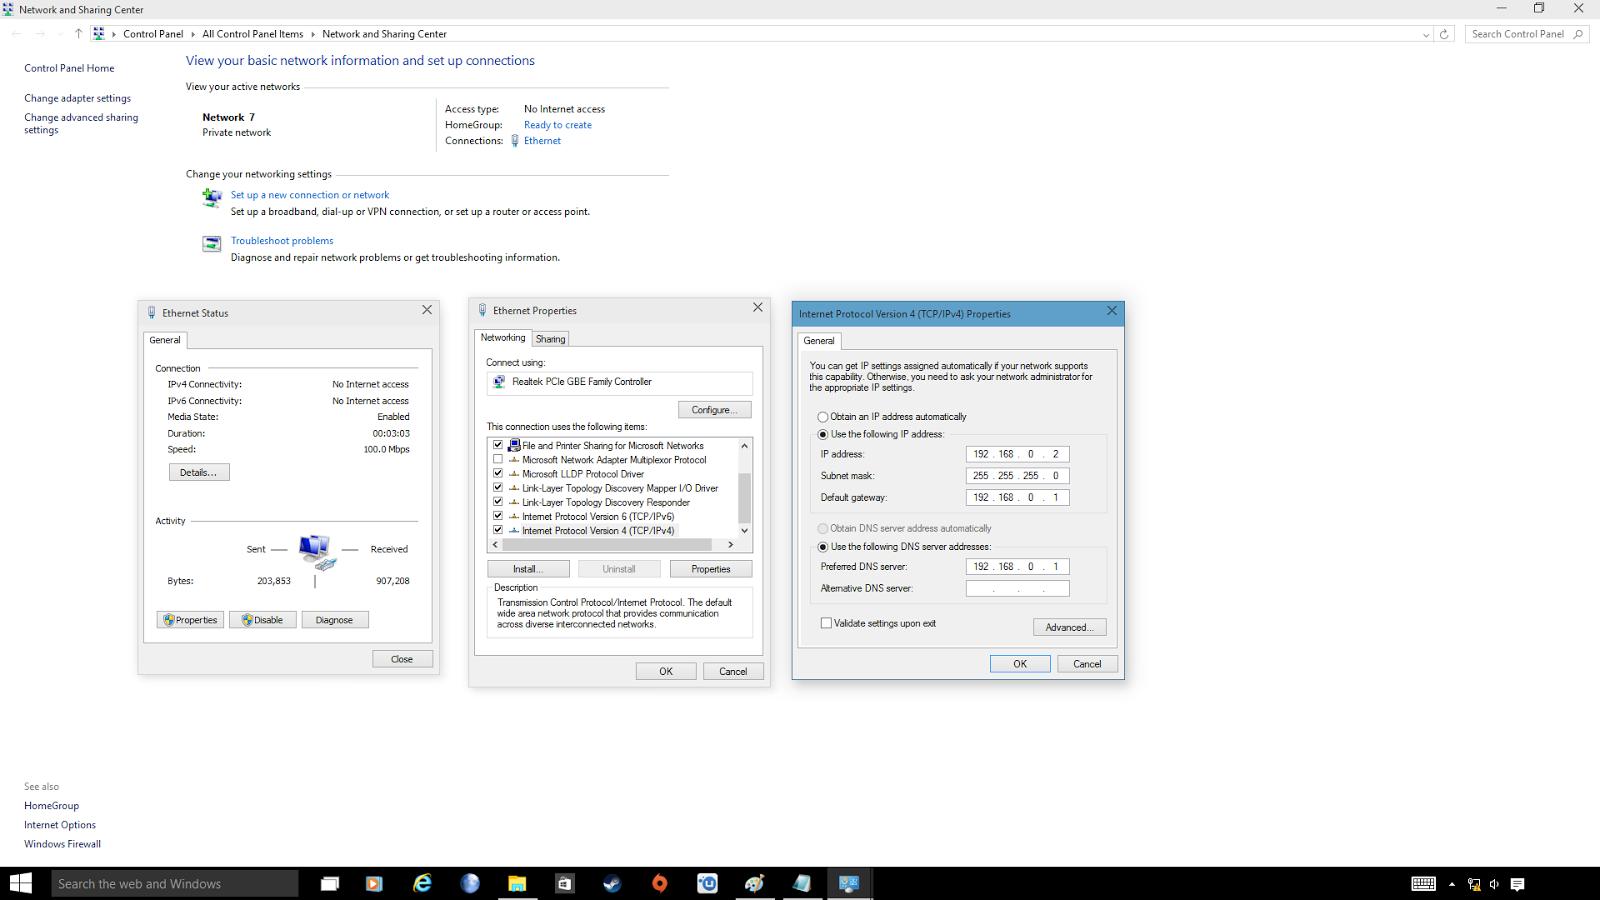 Sky Sagem N Adsl Wireless Router Unlock And Info